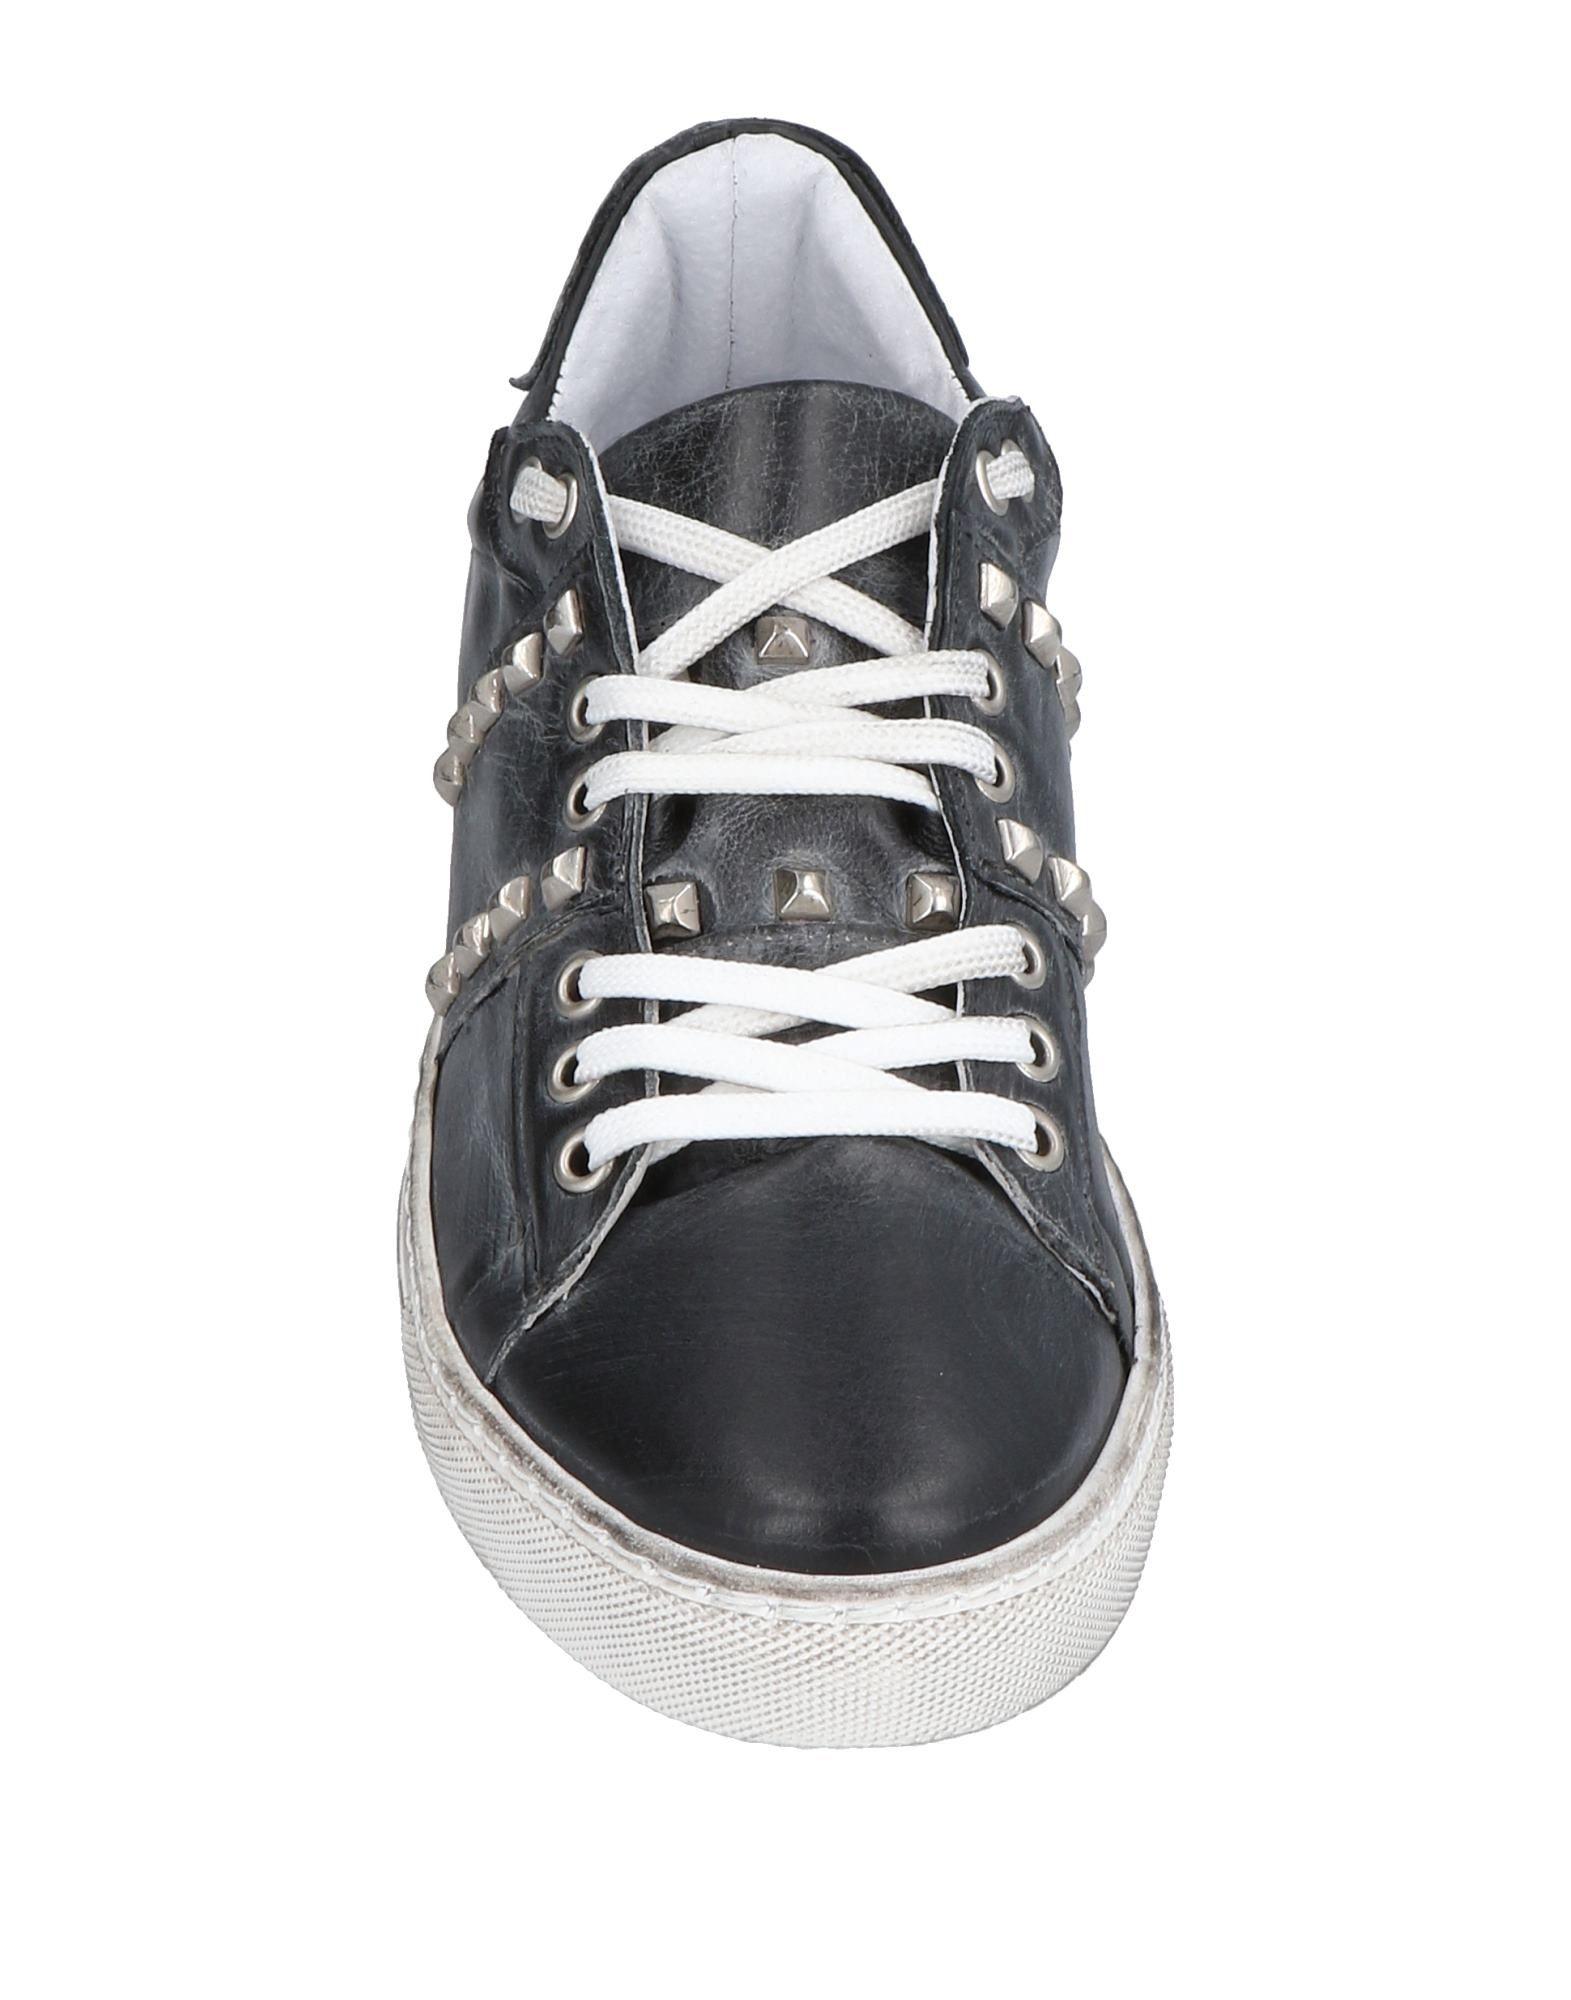 Riccianera Sneakers Sneakers Riccianera Damen  11487087AS Gute Qualität beliebte Schuhe a96b8f